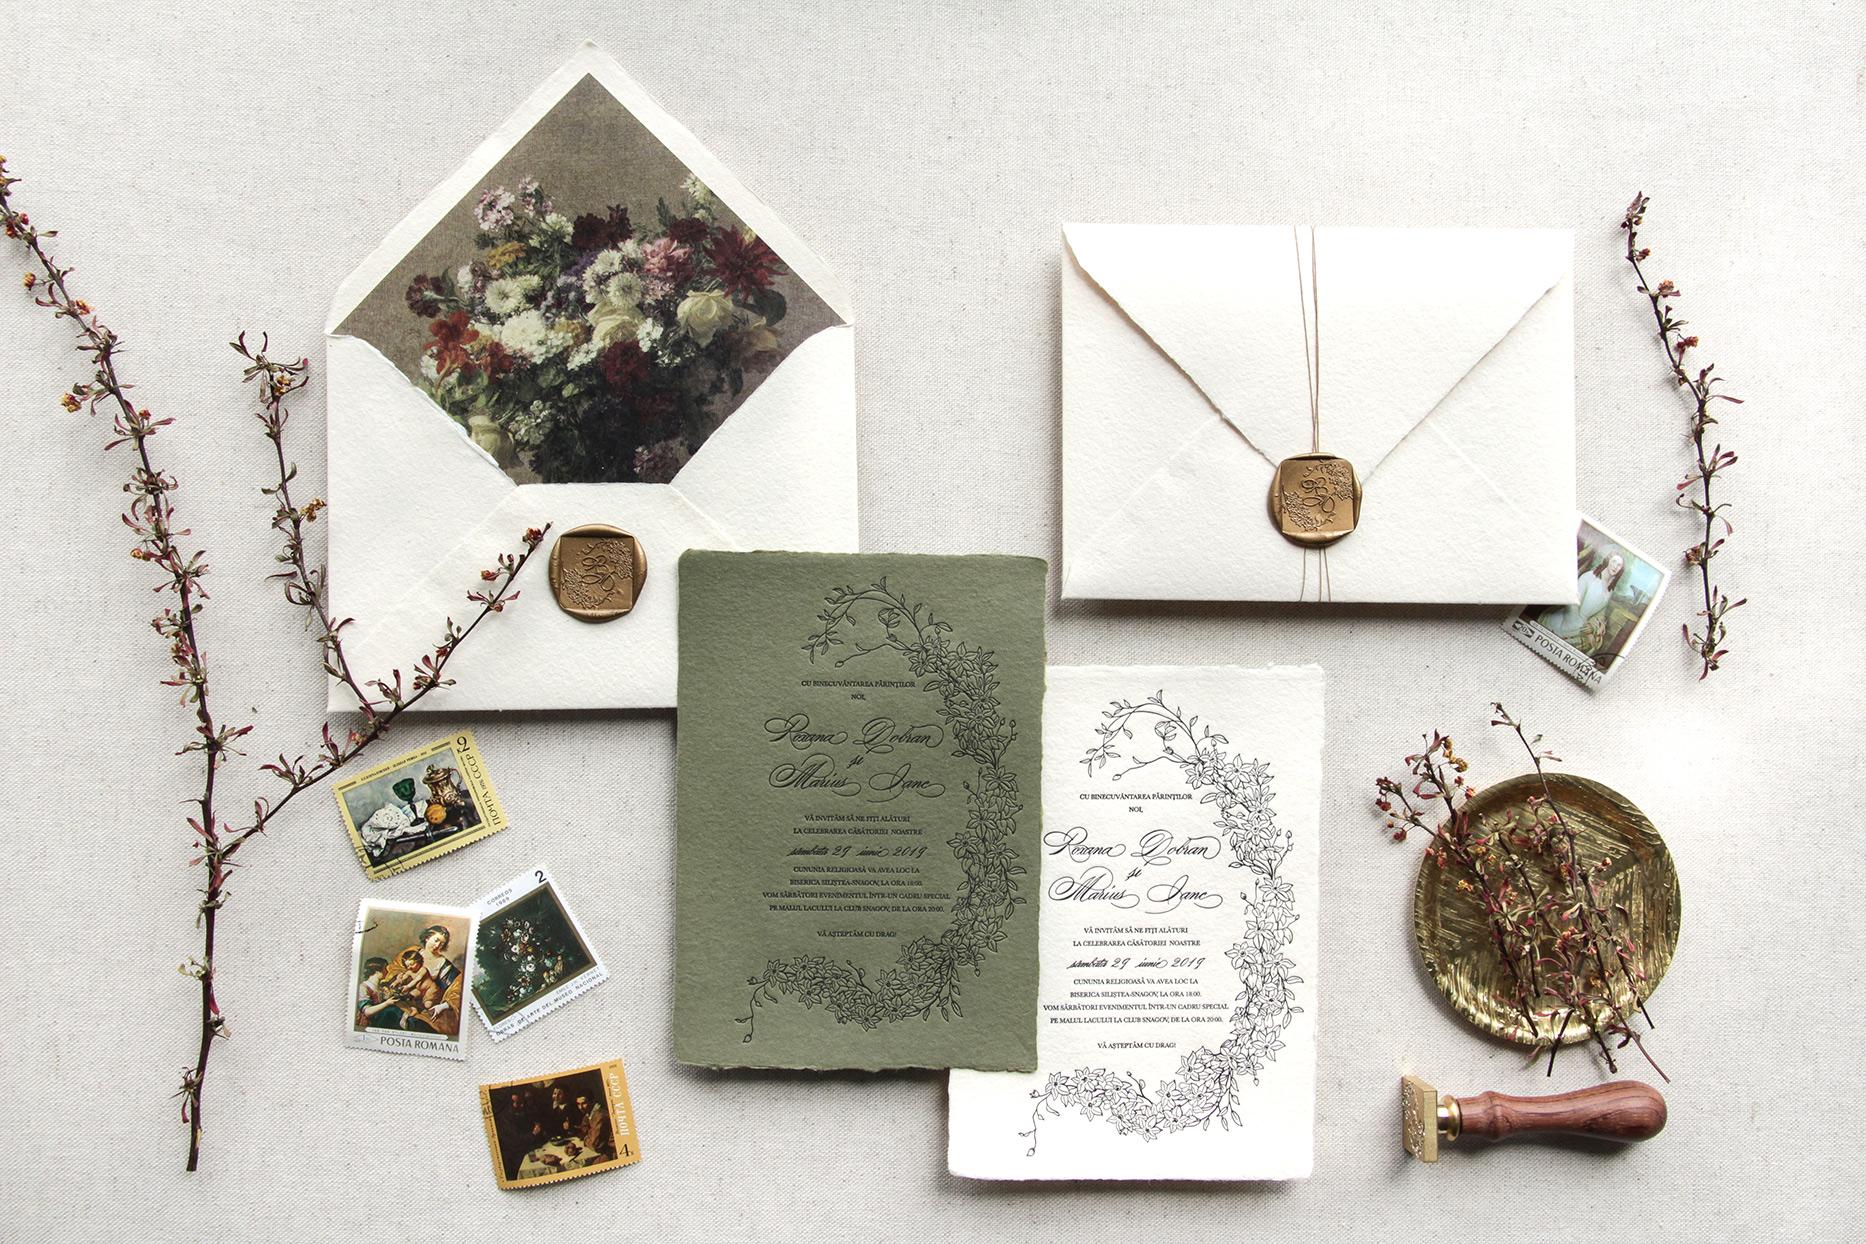 woodsy evergreen rustic wedding invitations